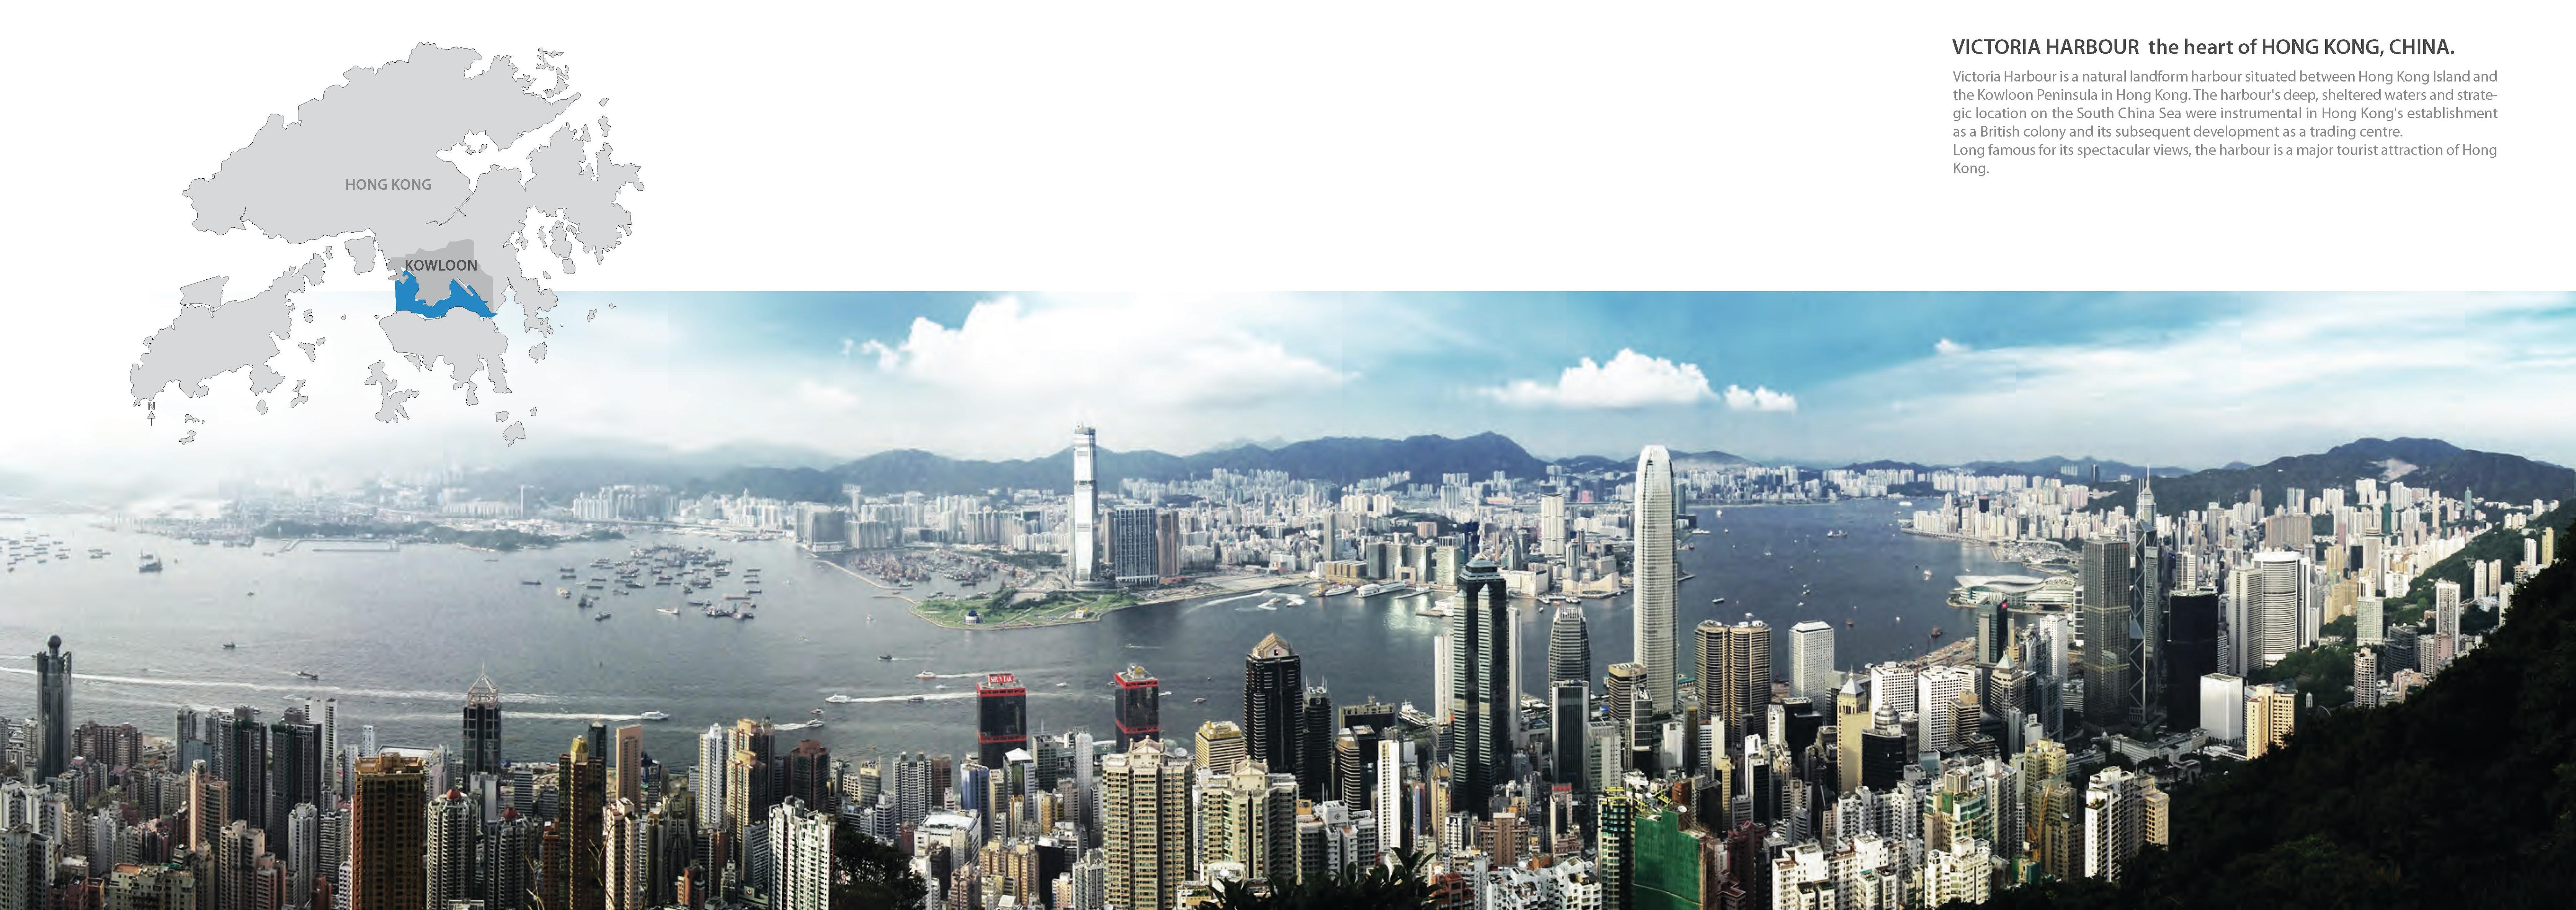 global metro urbanism- coastal defibrillation_Page_02